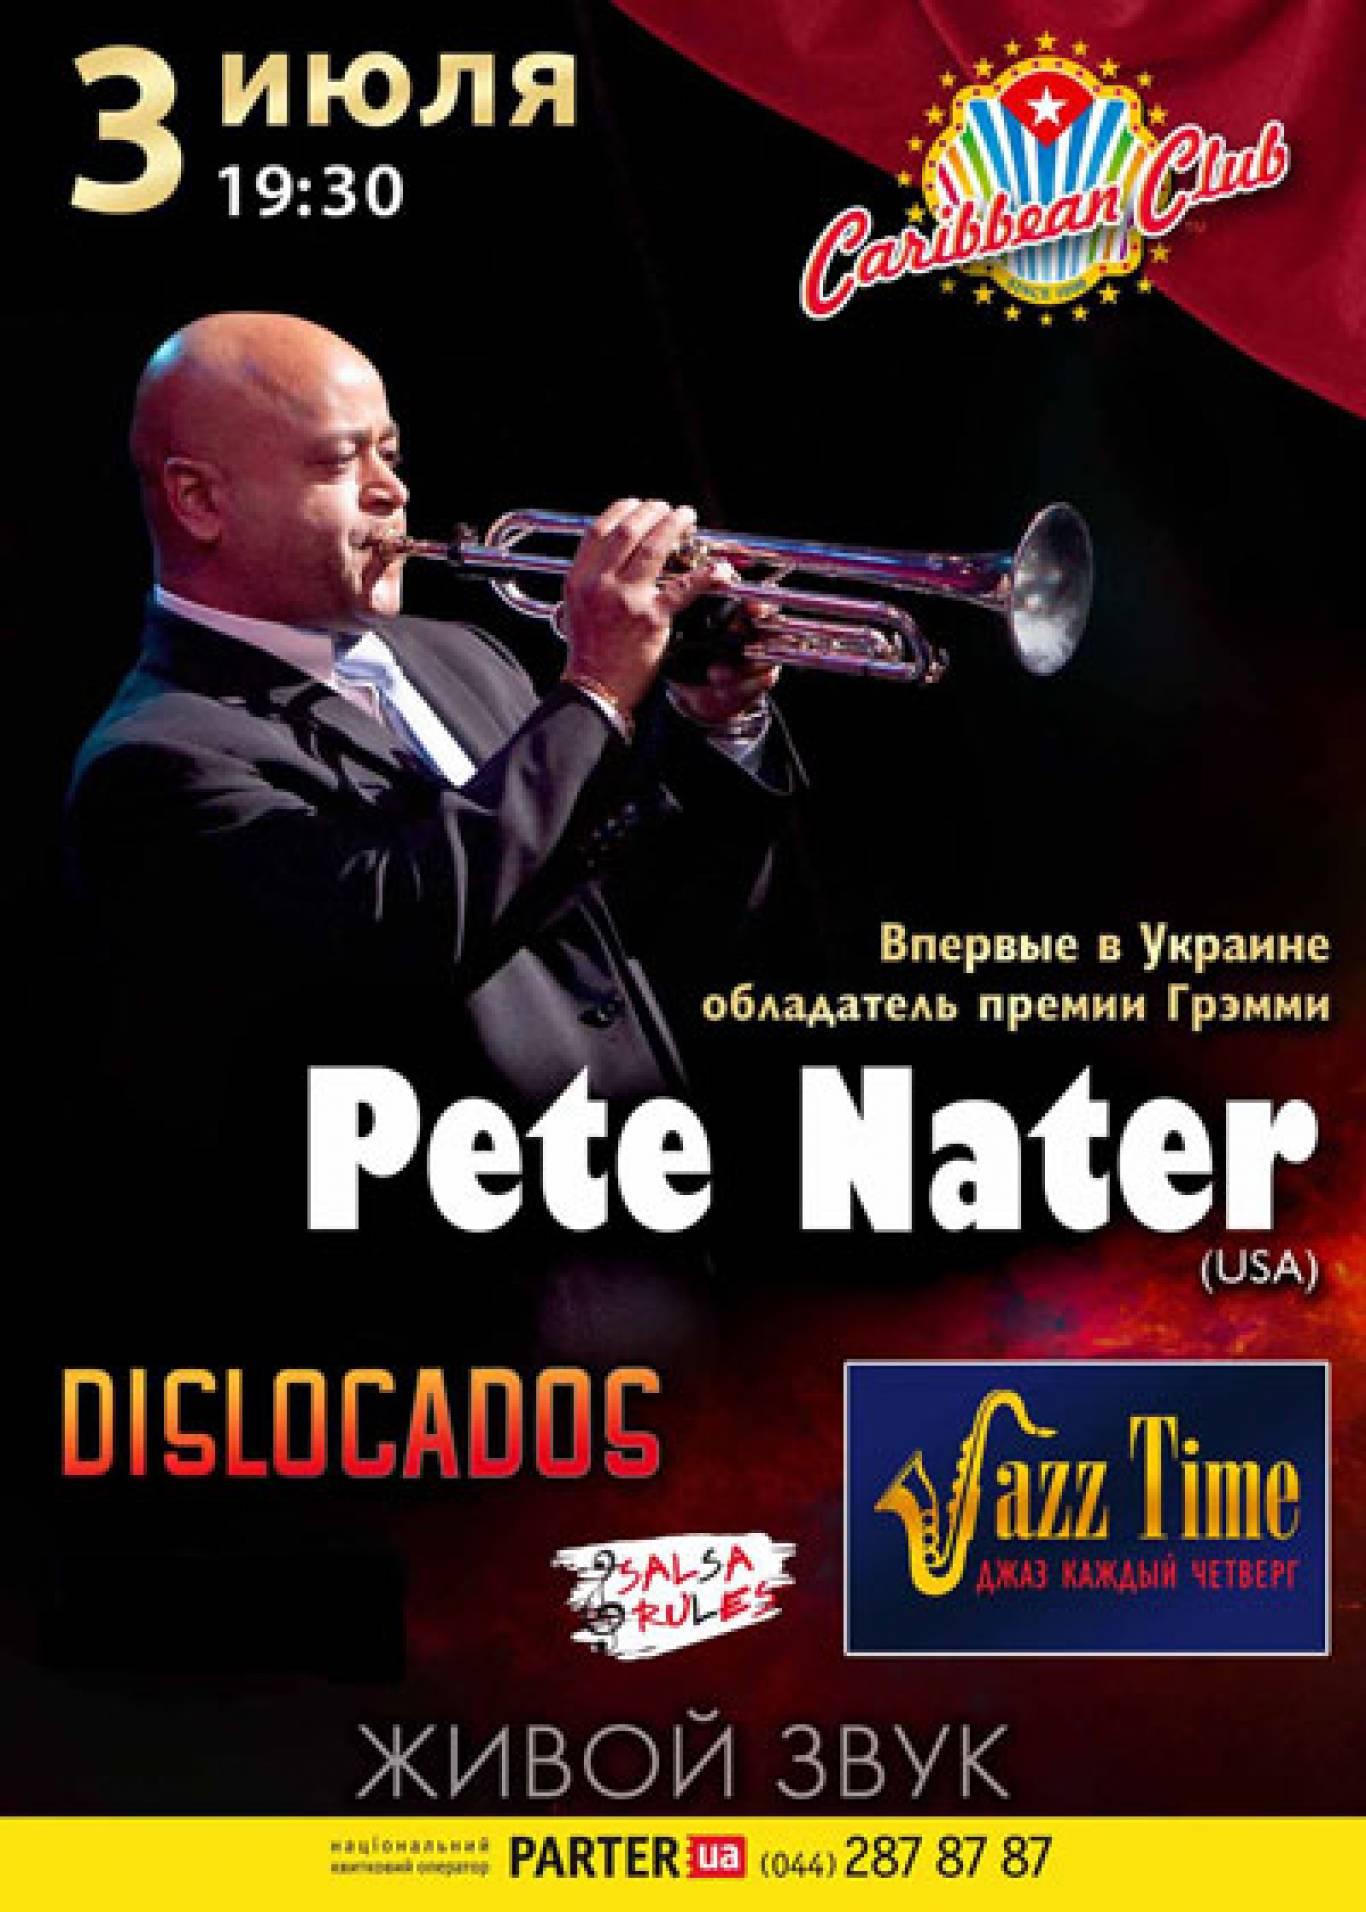 Концерт Піта Нейтера (Pete Nater) в Caribbean Club